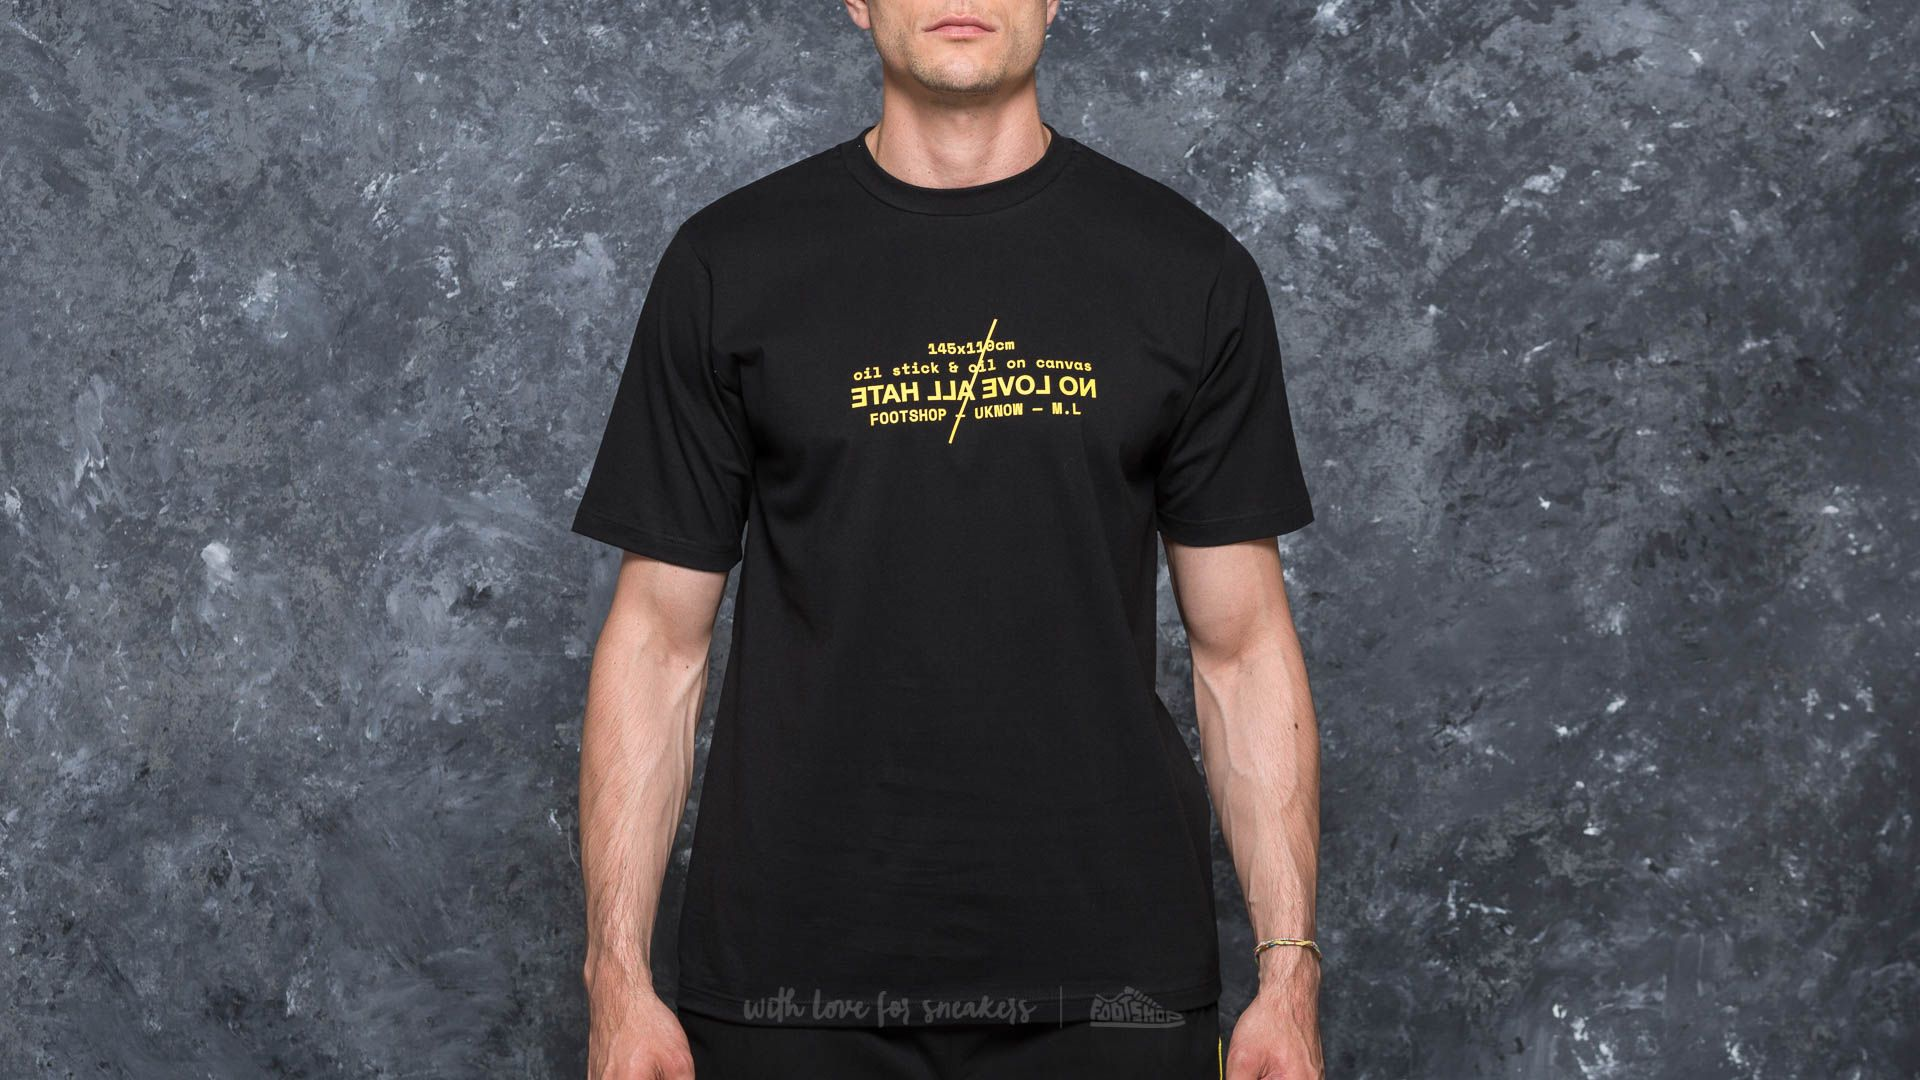 Footshop x UKNOW x M.L T-Shirt Black